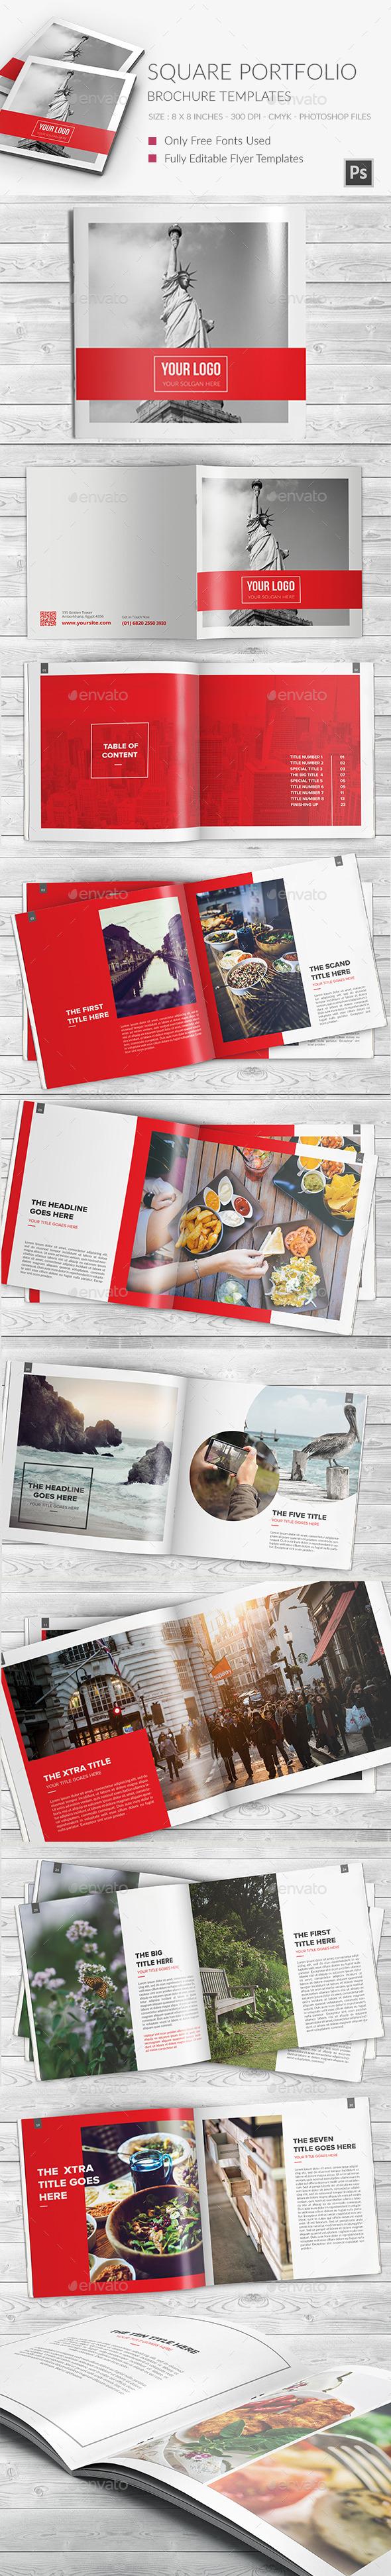 Square Portfolio Brochure Template - Portfolio Brochures